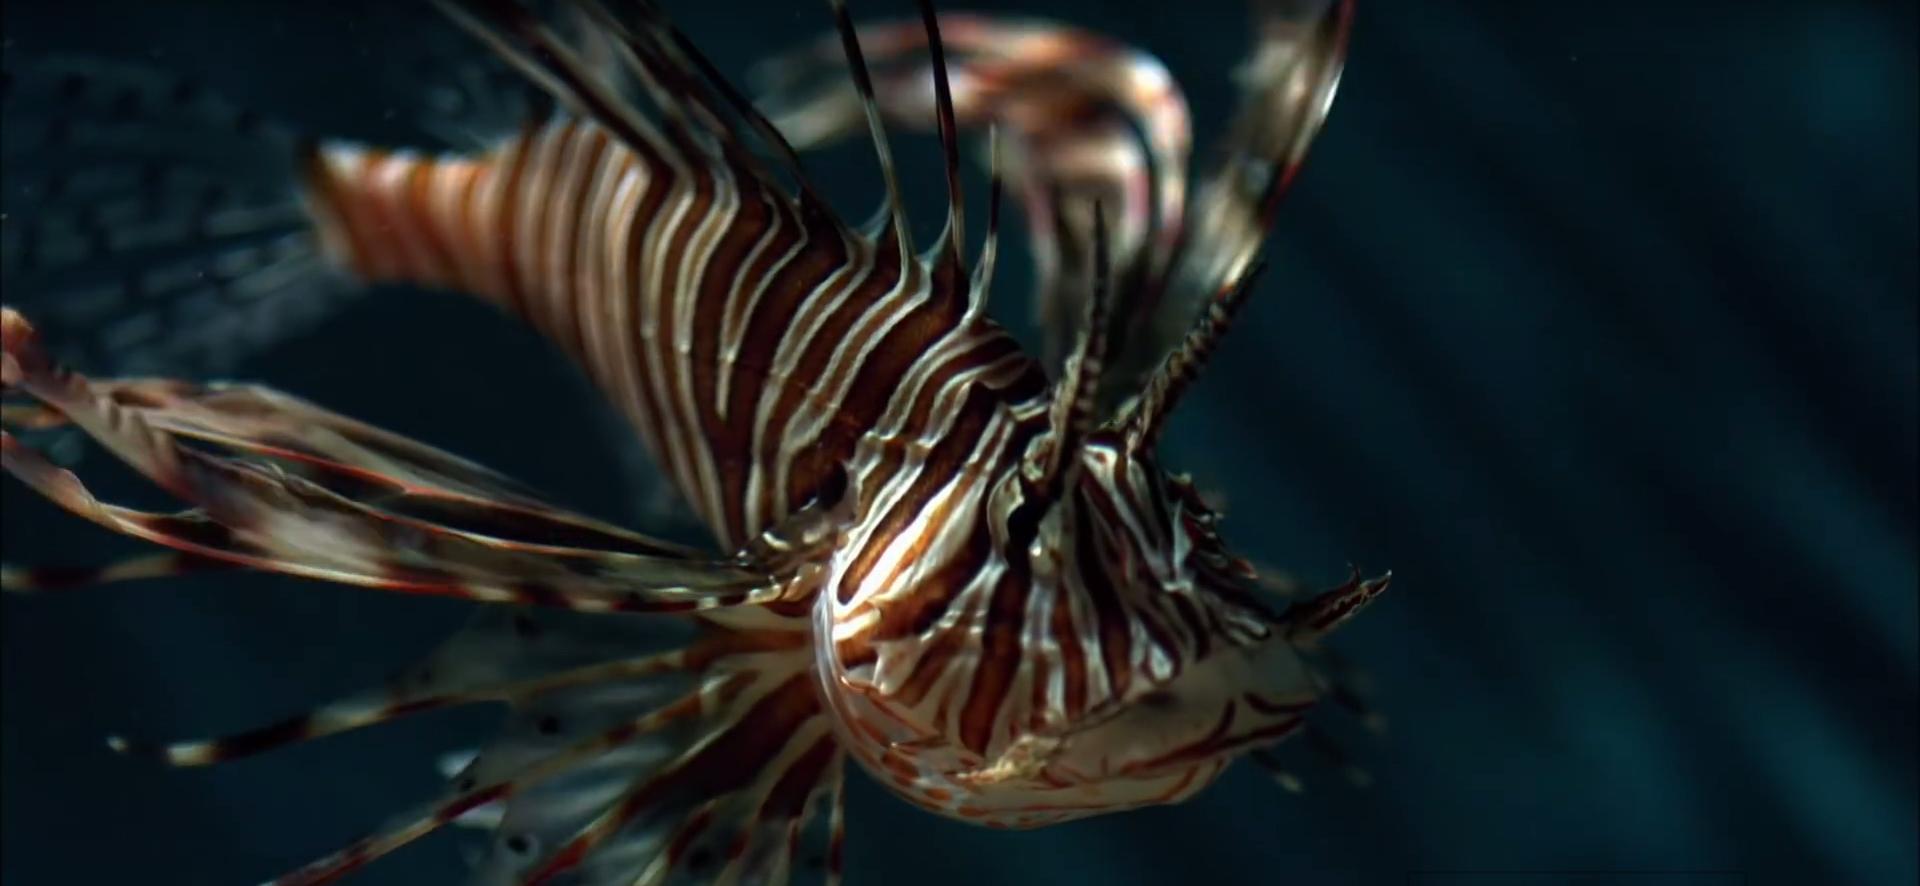 morski-paun